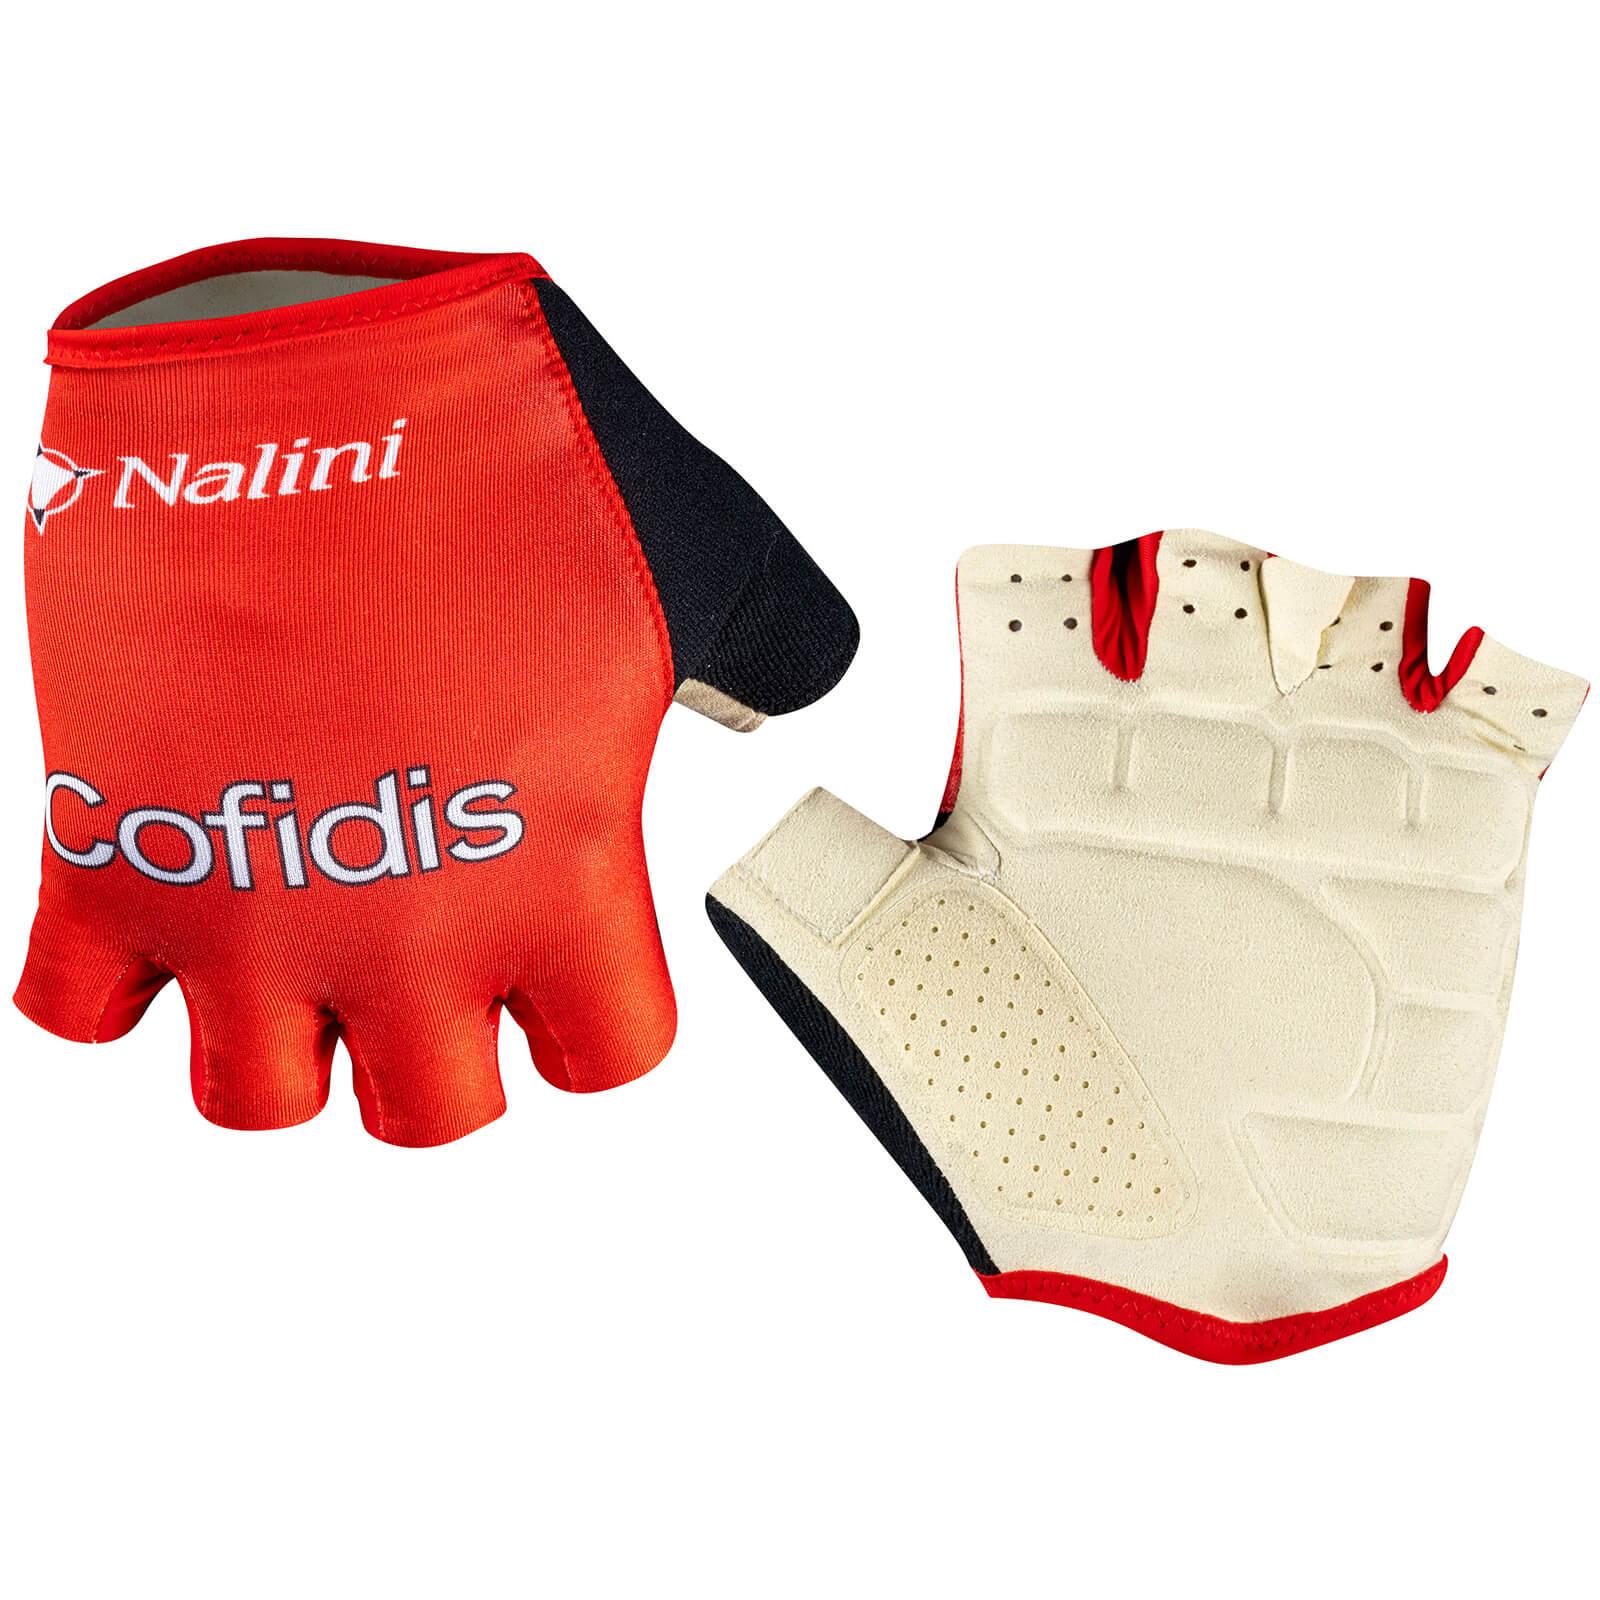 Nalini Cofidis Gloves - M